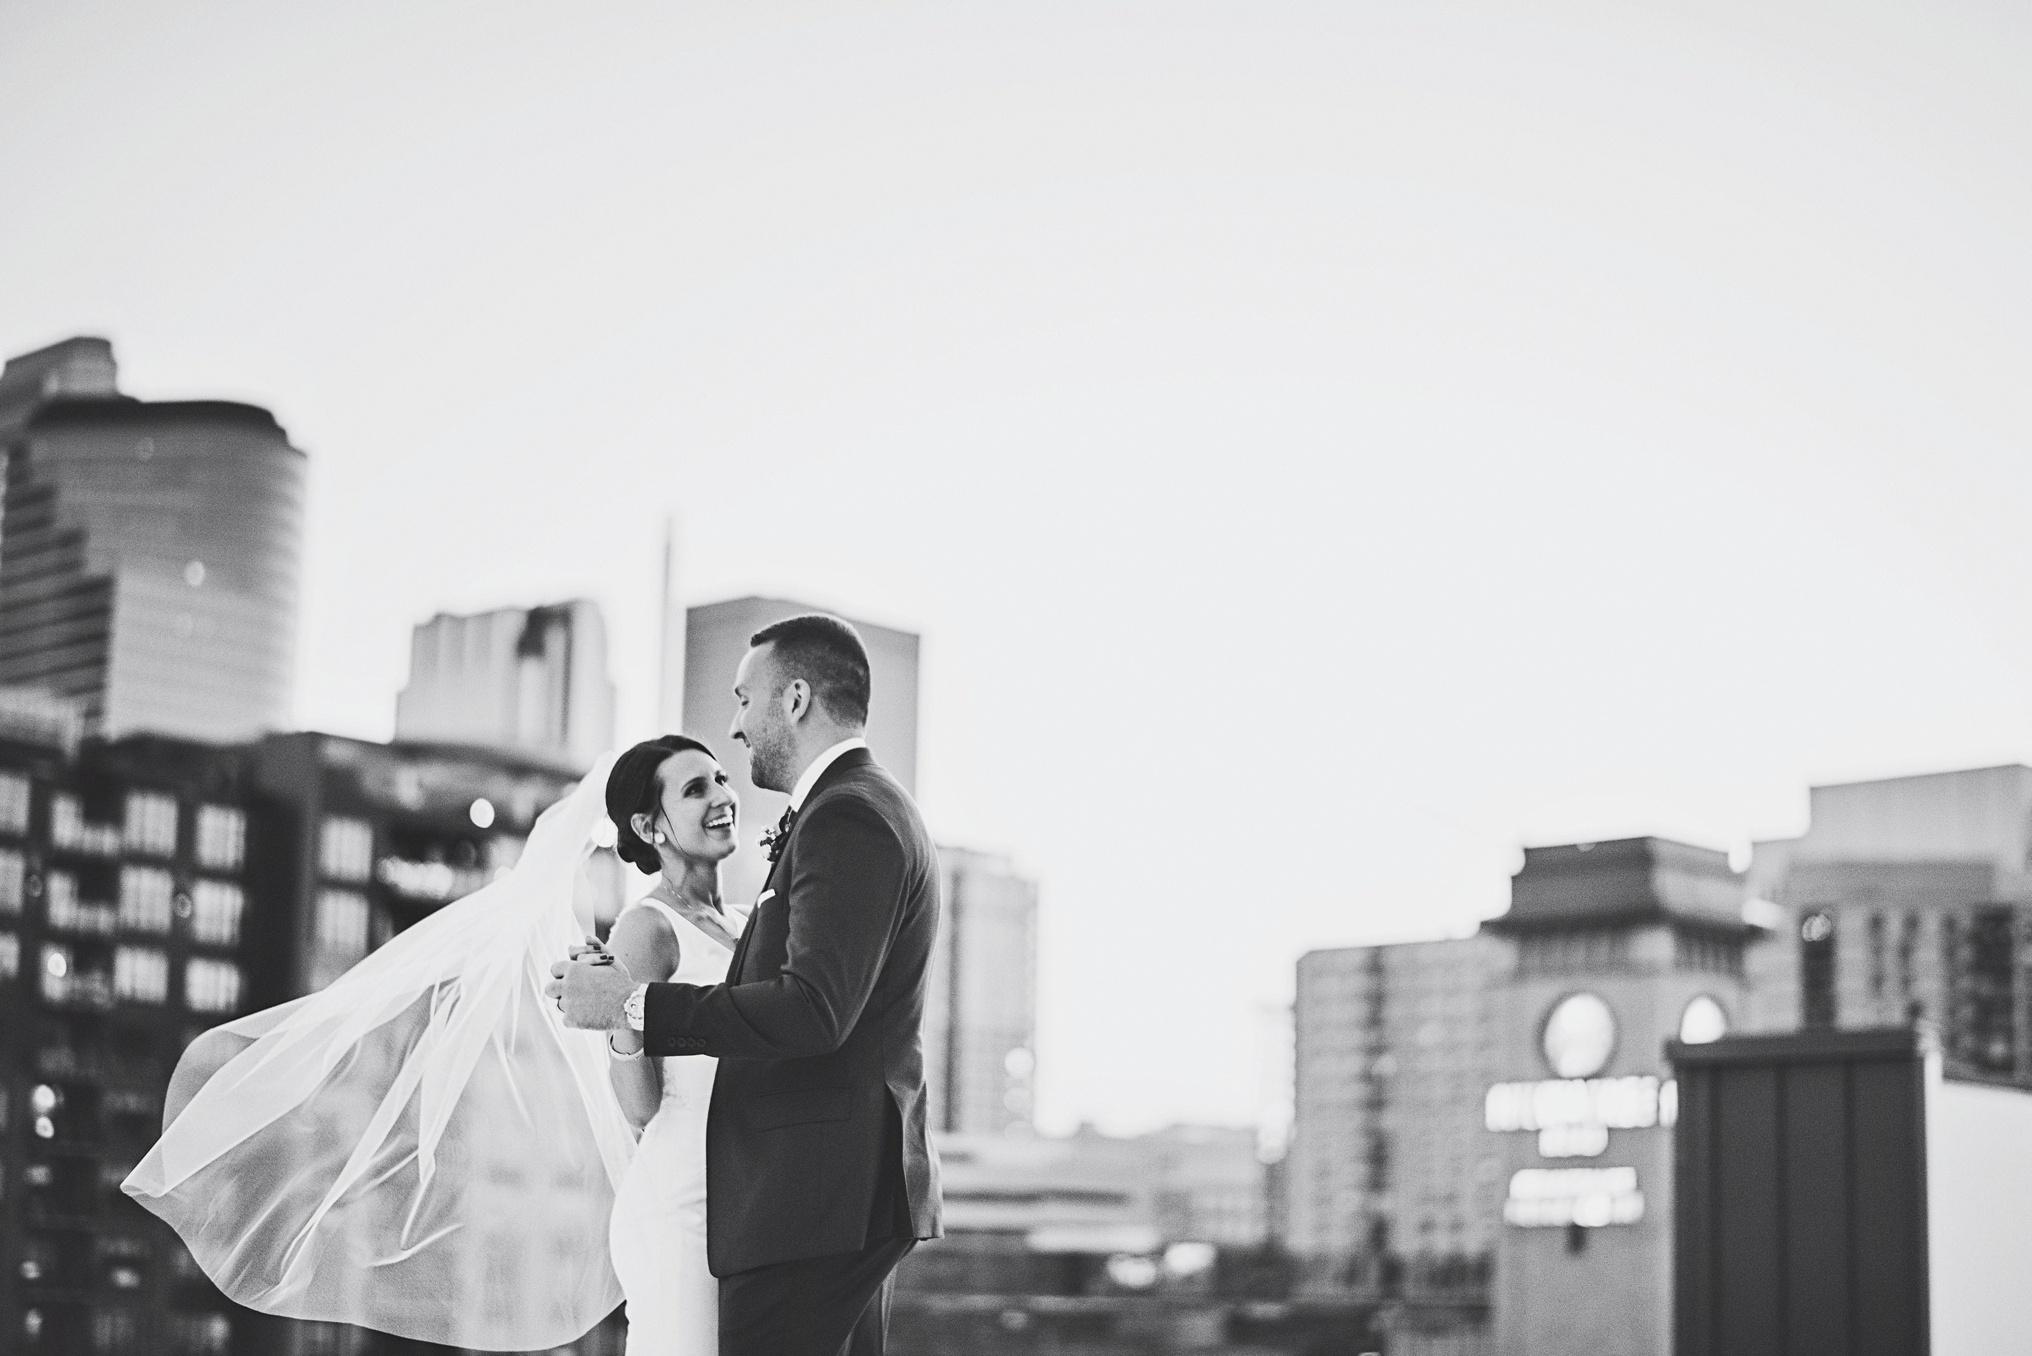 best_wedding_photography_2017_by_lucas_botz_photography_153.jpg